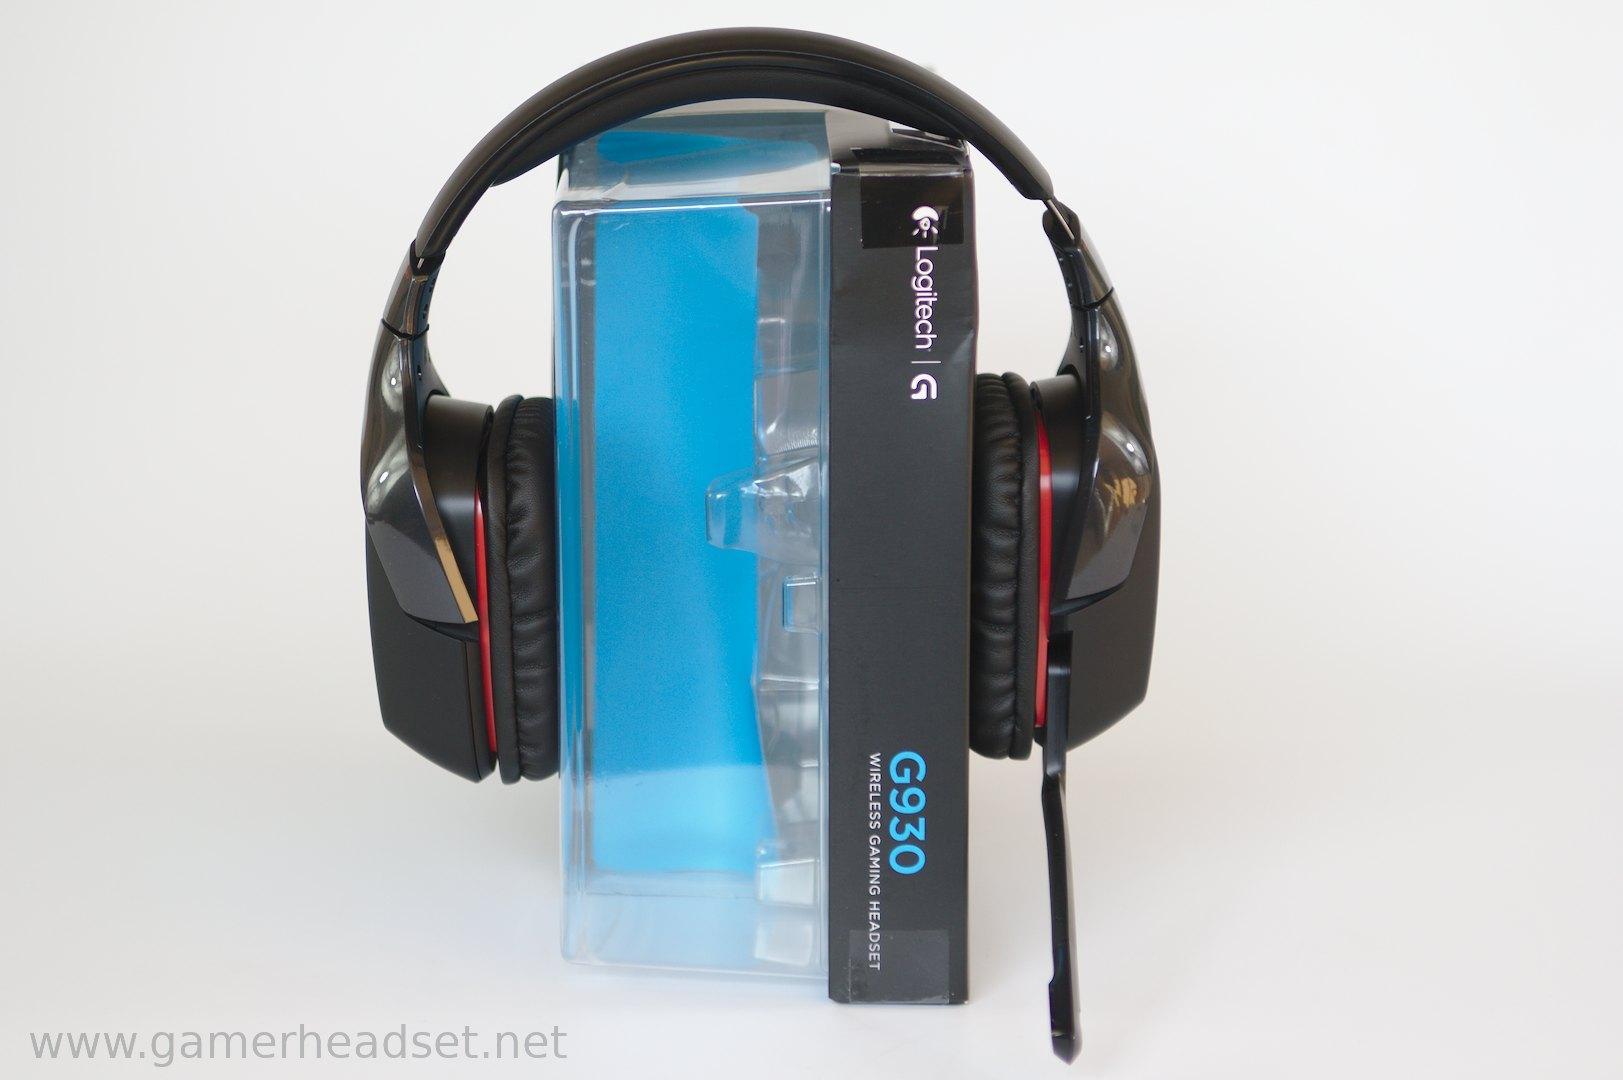 Logitech G930 wireless im Test   Gamer Headset